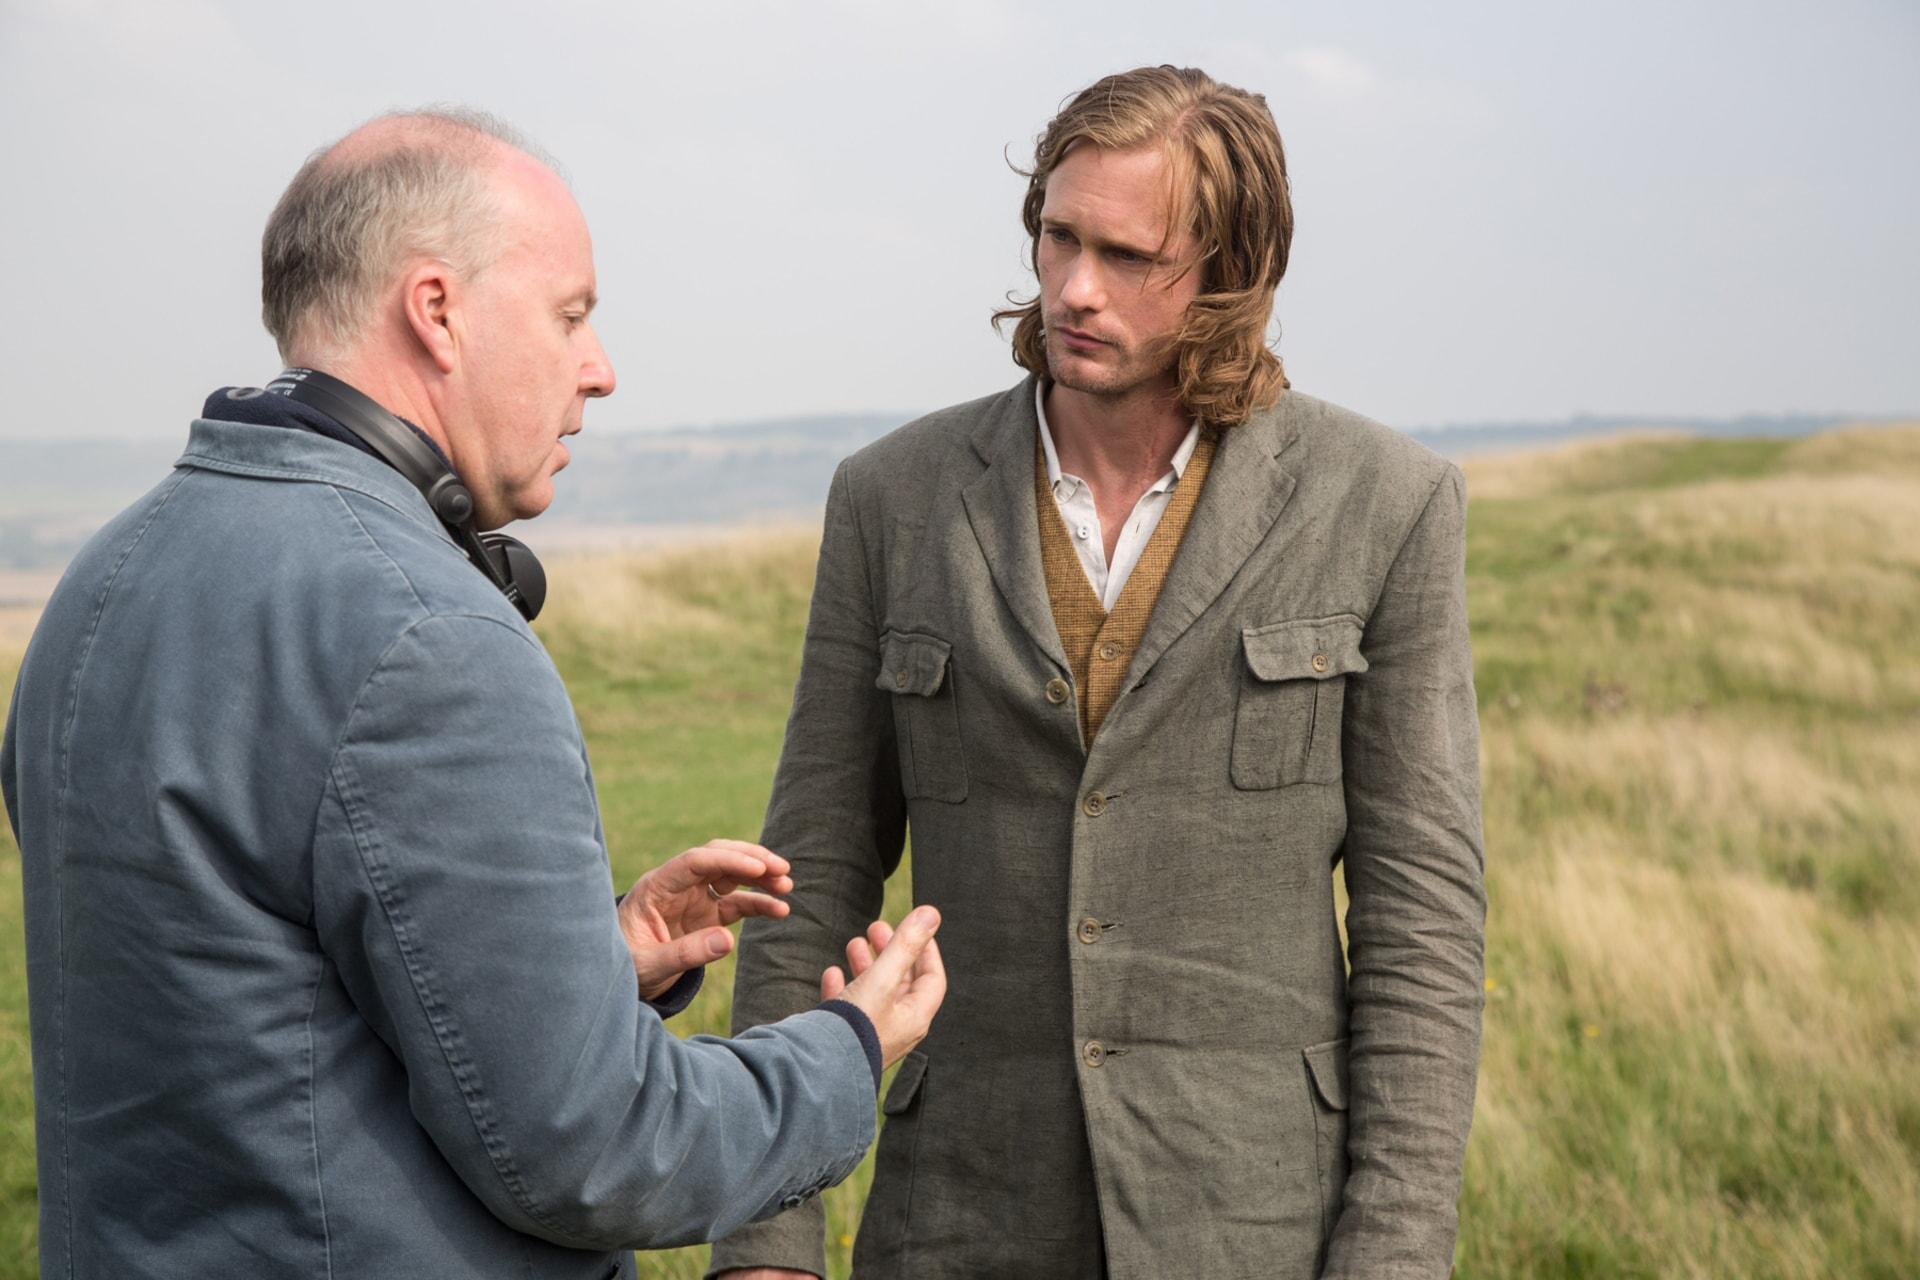 Director DAVID YATES and ALEXANDER SKARSGÅRD behind the scenes on the set